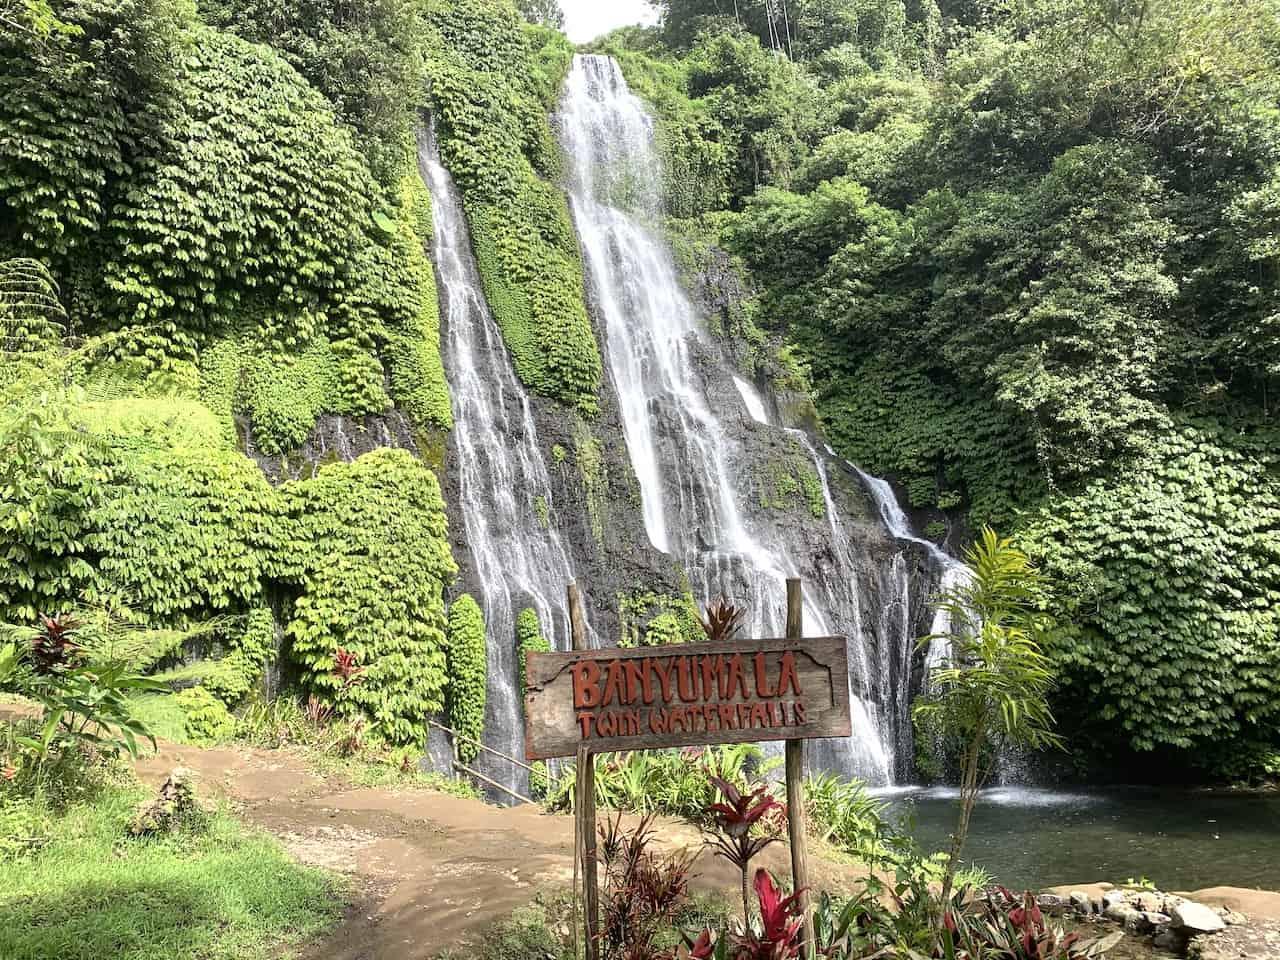 Banyulama Twin Waterfall Bali